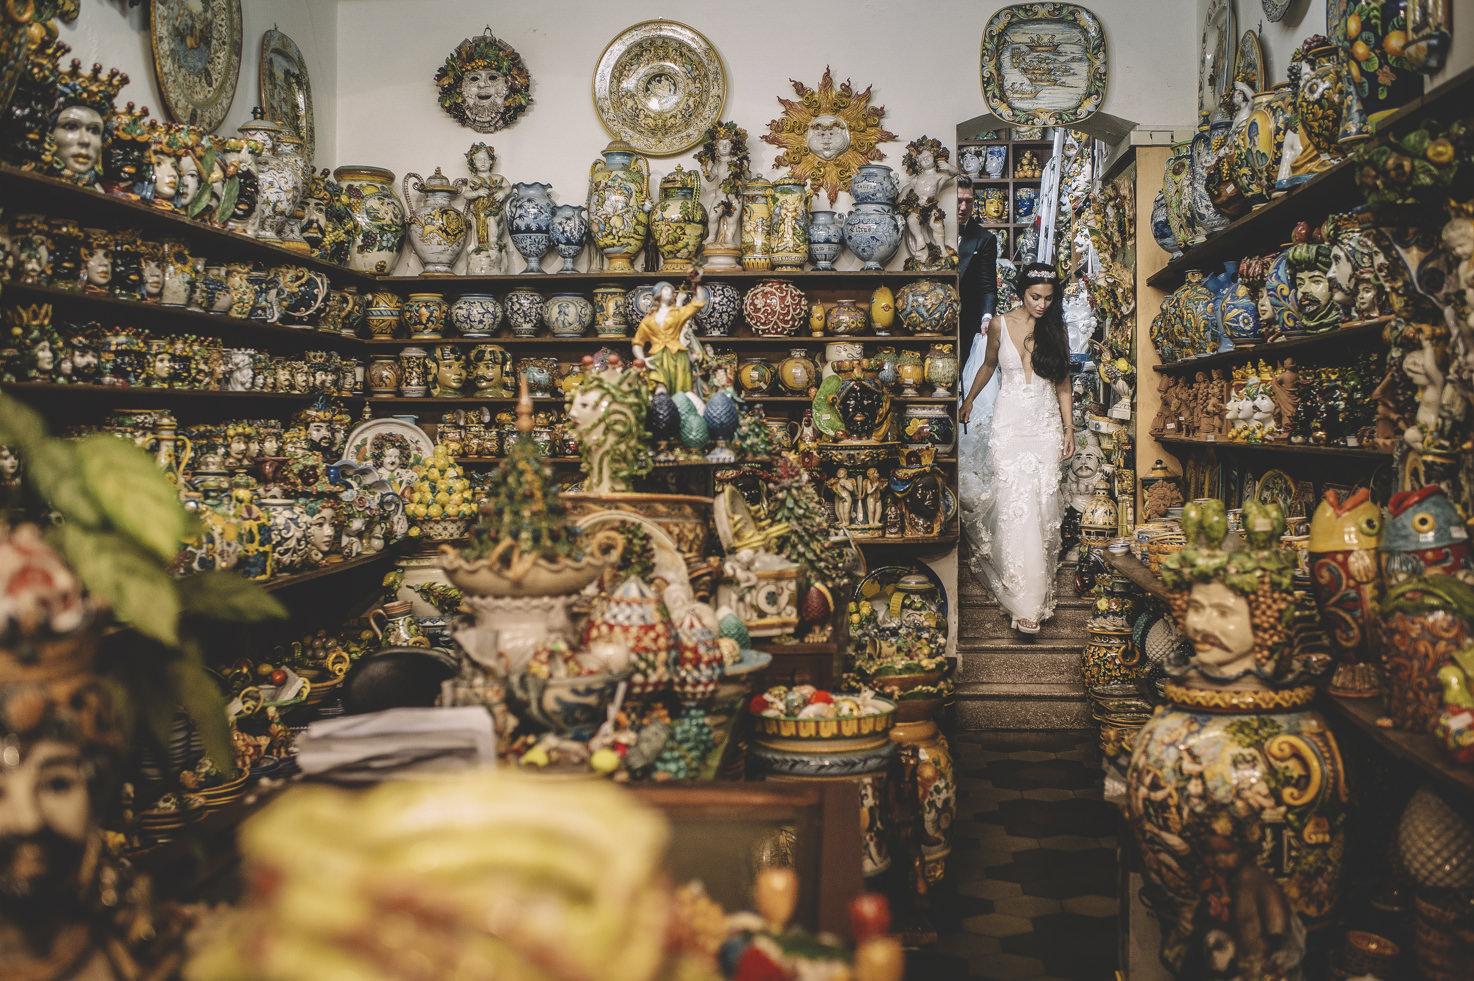 Maiolica shop in Sicily